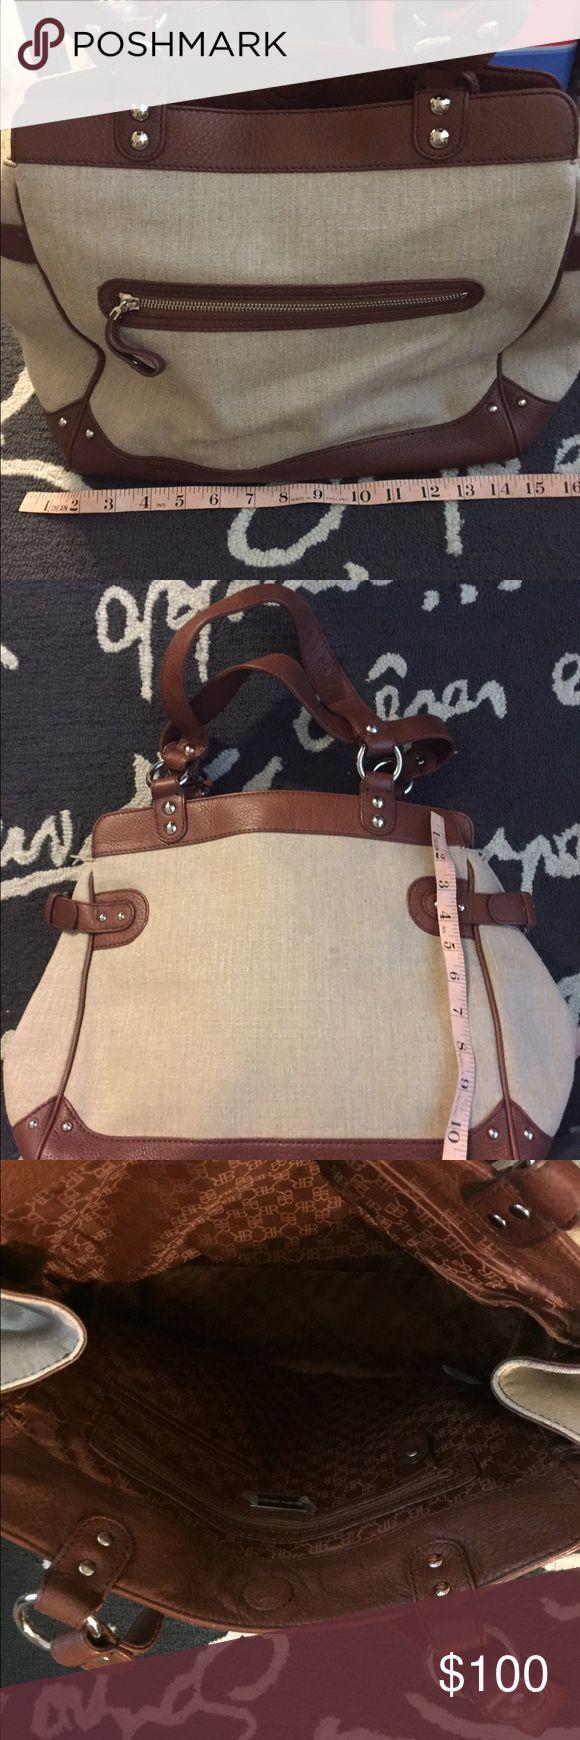 Banana Republic linen leather trim bag Beautiful brown soft leather trim linen bag. You need this bag!! Banana Republic Bags Totes